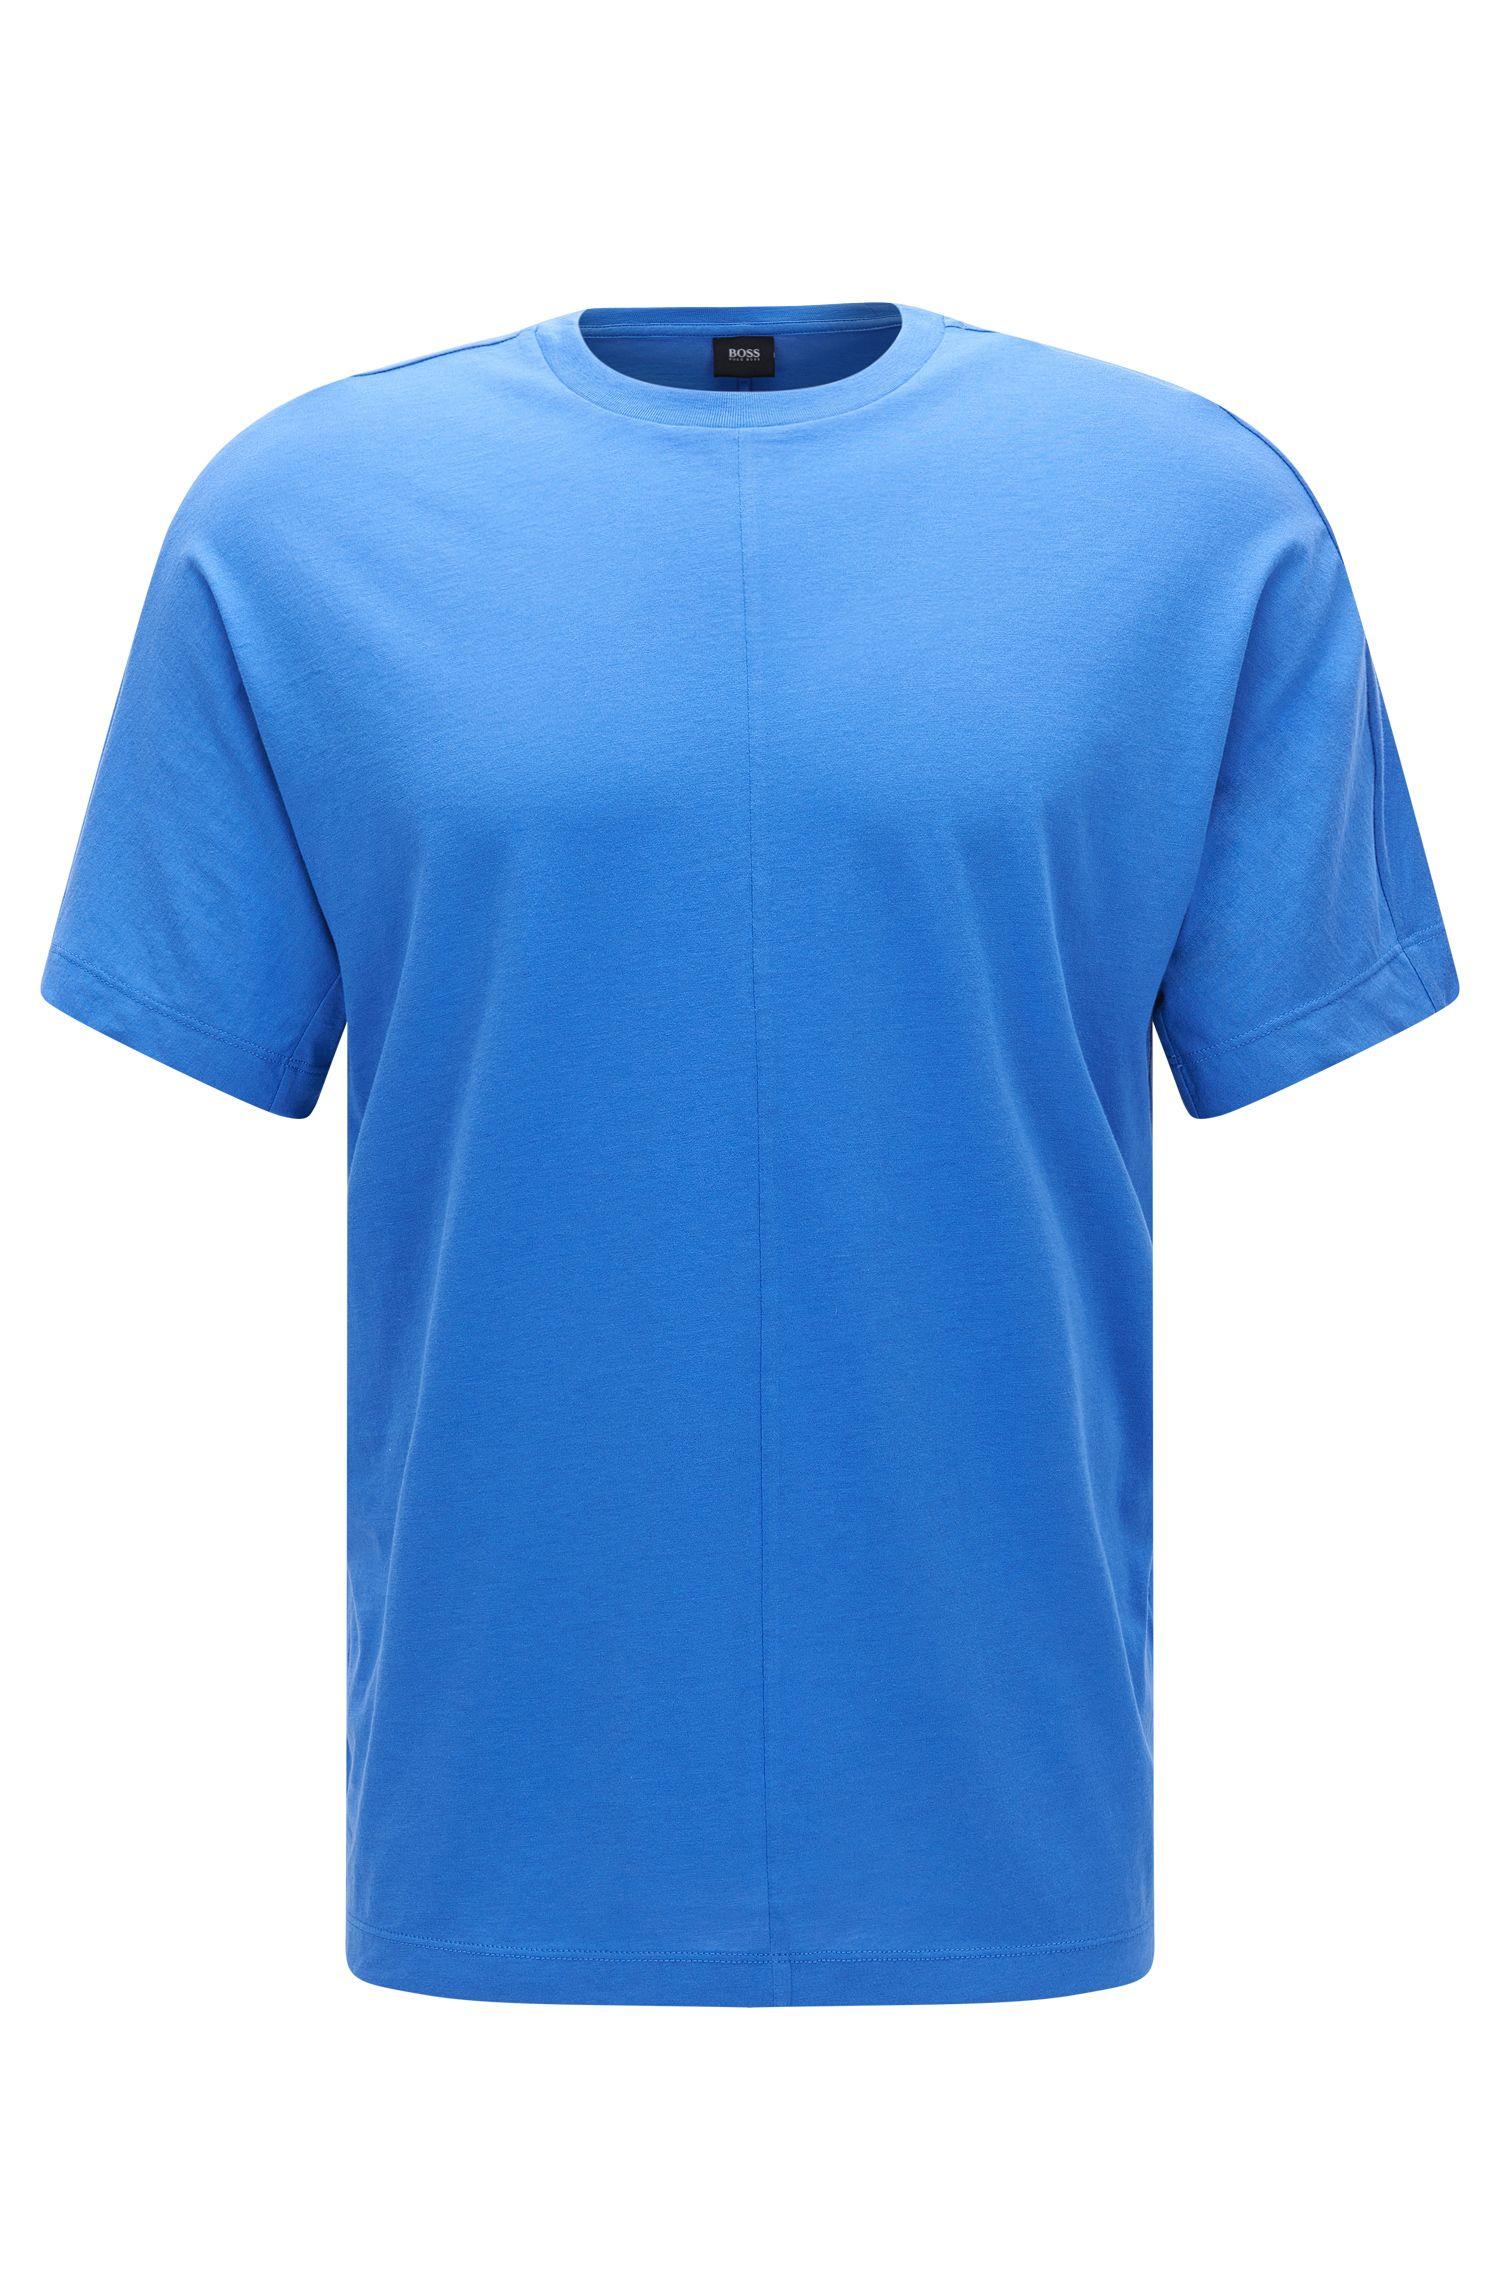 T-shirt Regular Fit en coton, à coutures apparentes: «Tiburt 23»